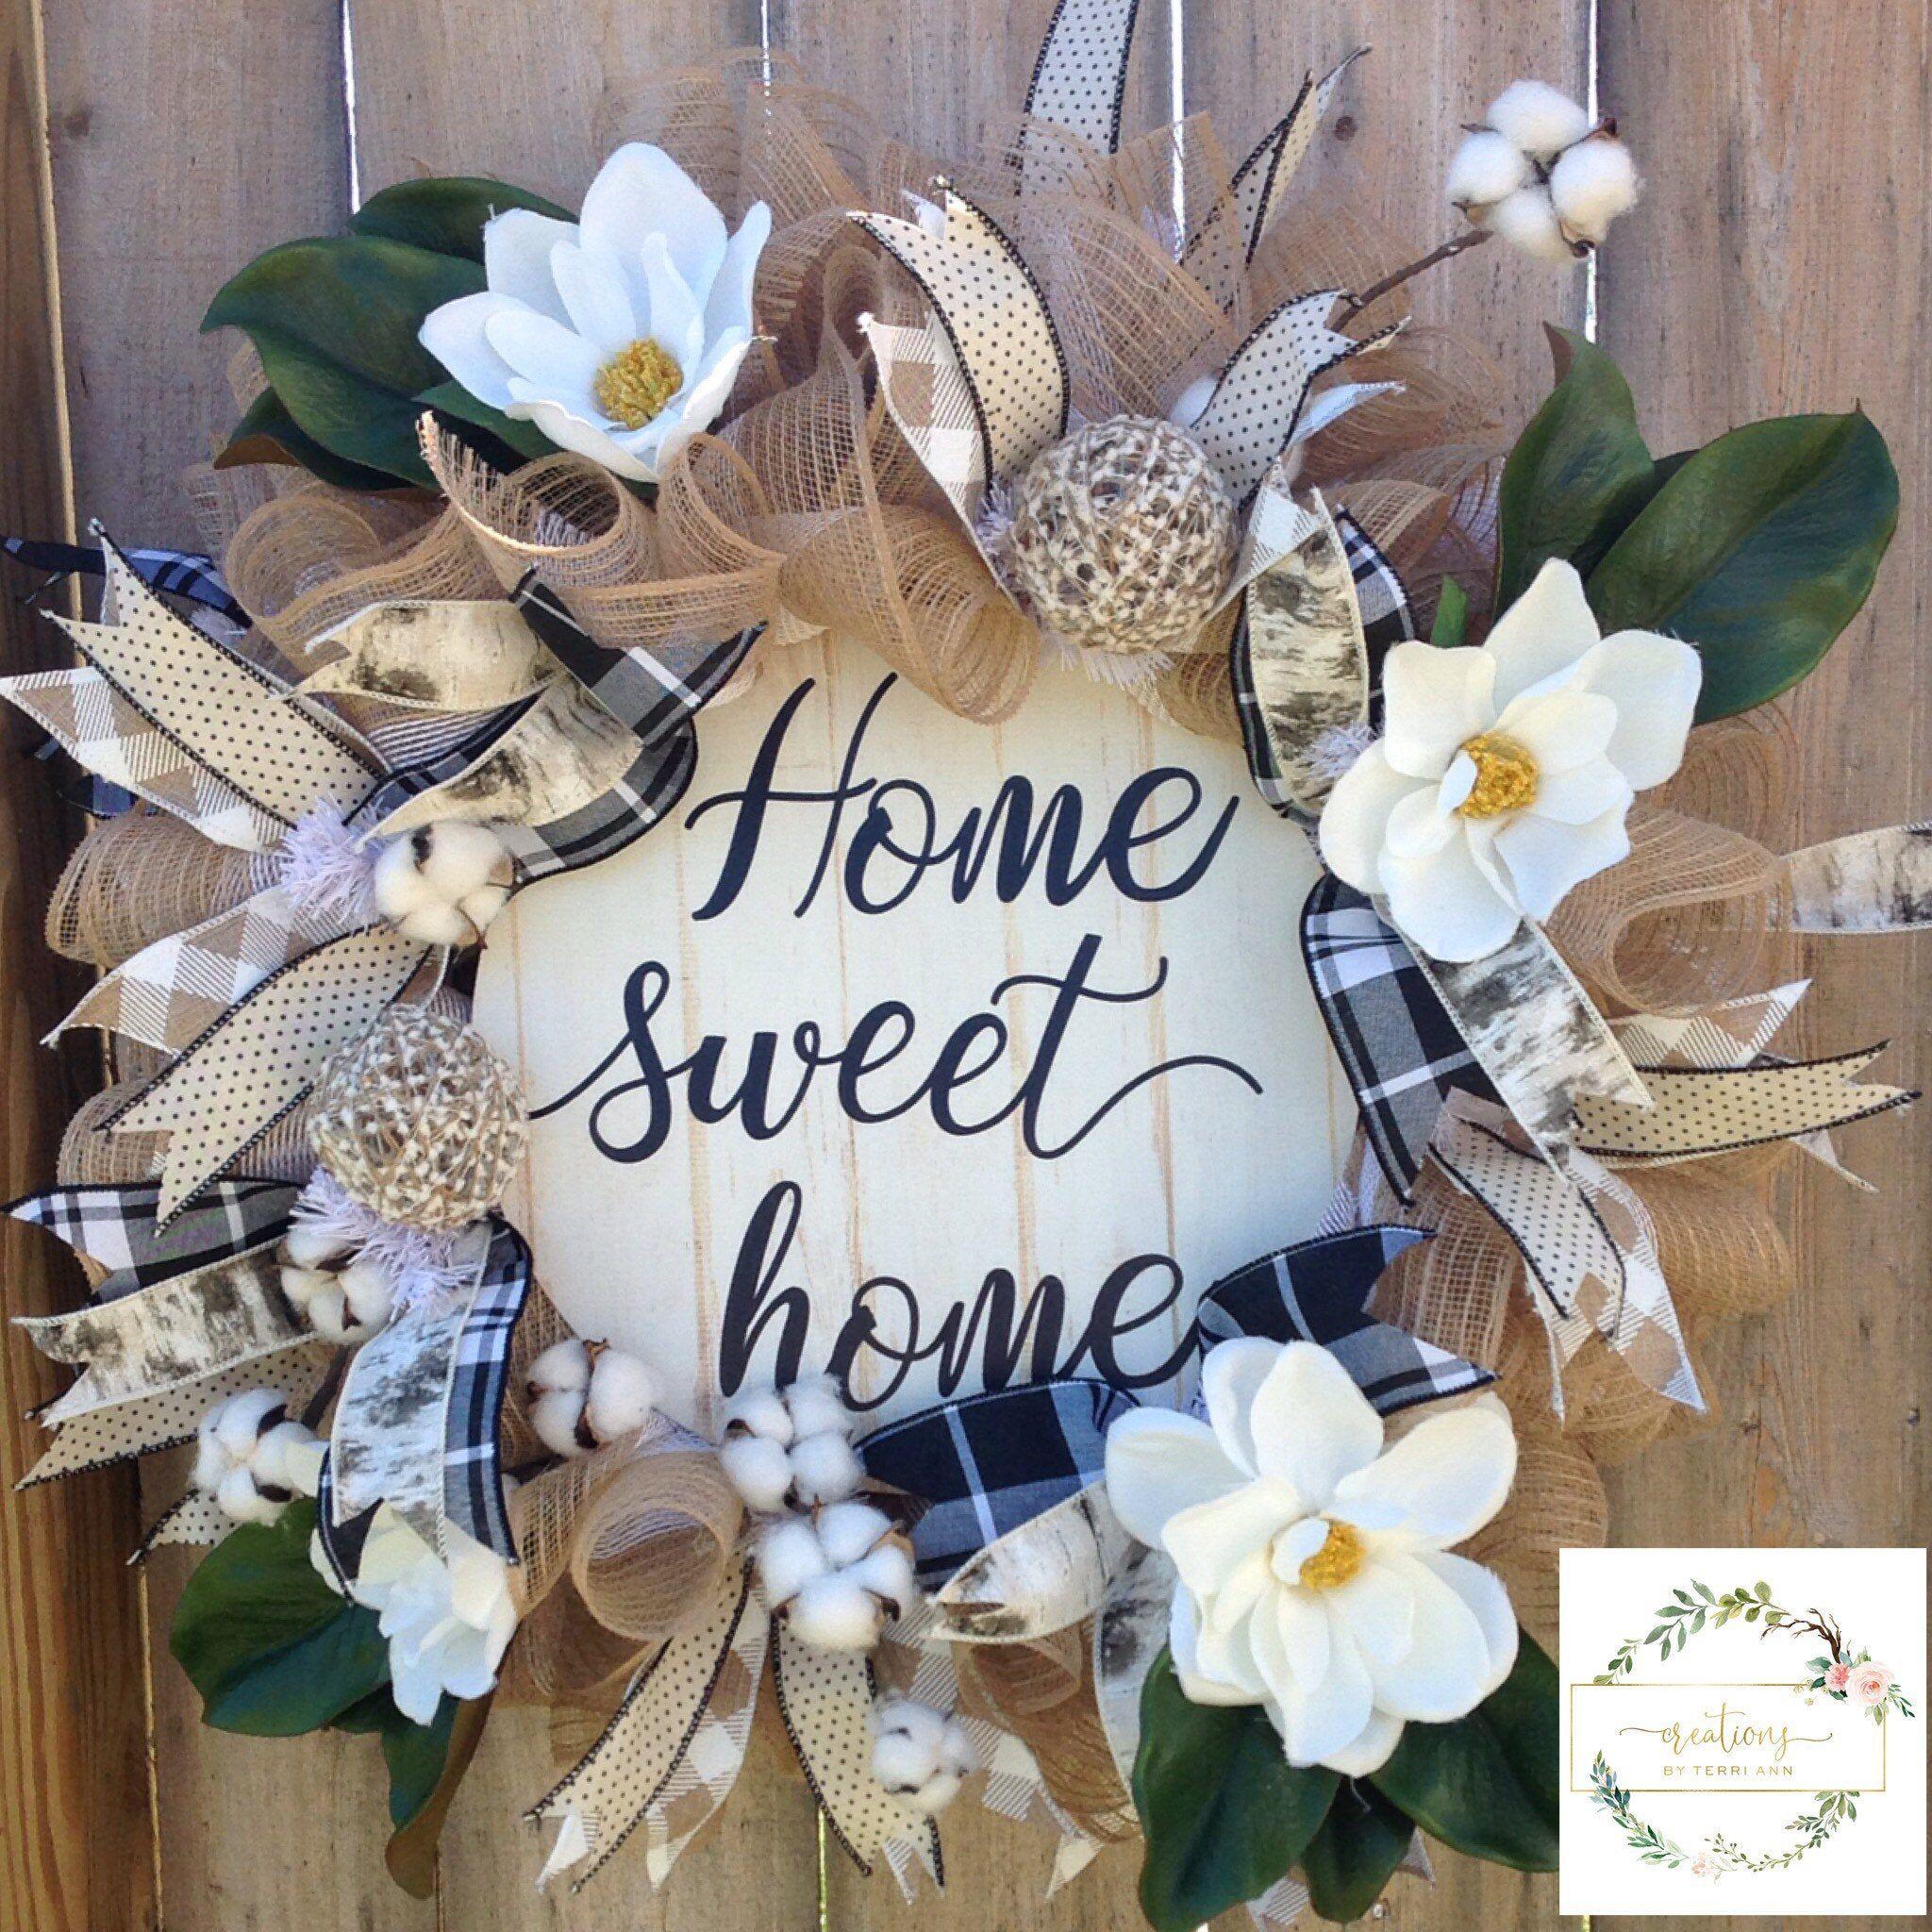 Photo of White wreath of magnolia. Magnolia leaf wreath. Magnolia wreath. Cotton wreath. Peasant wreath. Burlap wreath. Farmhouse chic decor XL wreath